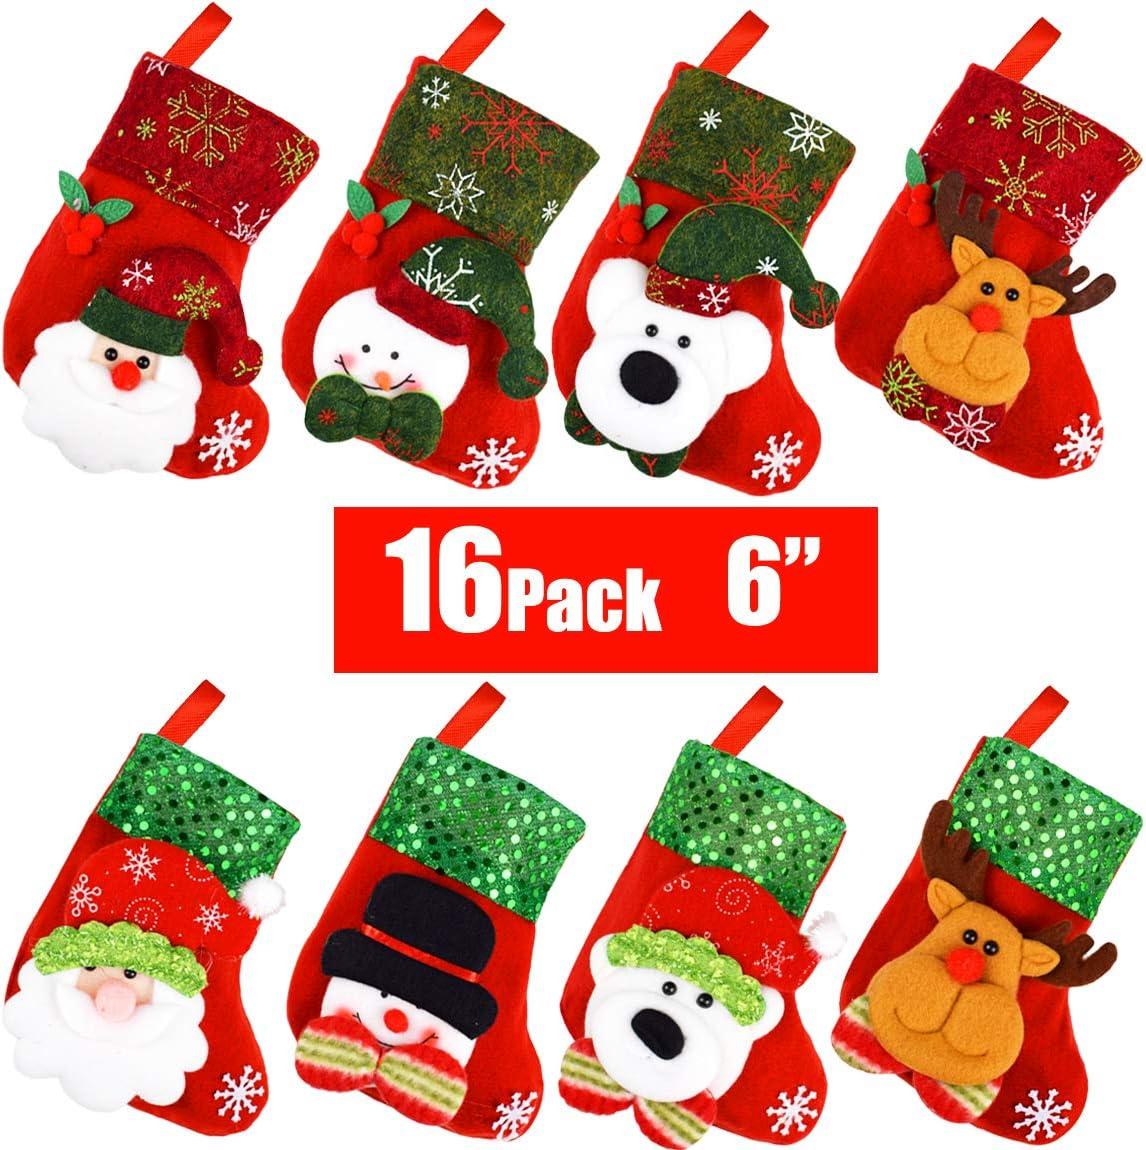 Danirora Mini Christmas Stockings Bulk 16 Small Pack Xmas Complete Free Super-cheap Shipping 6